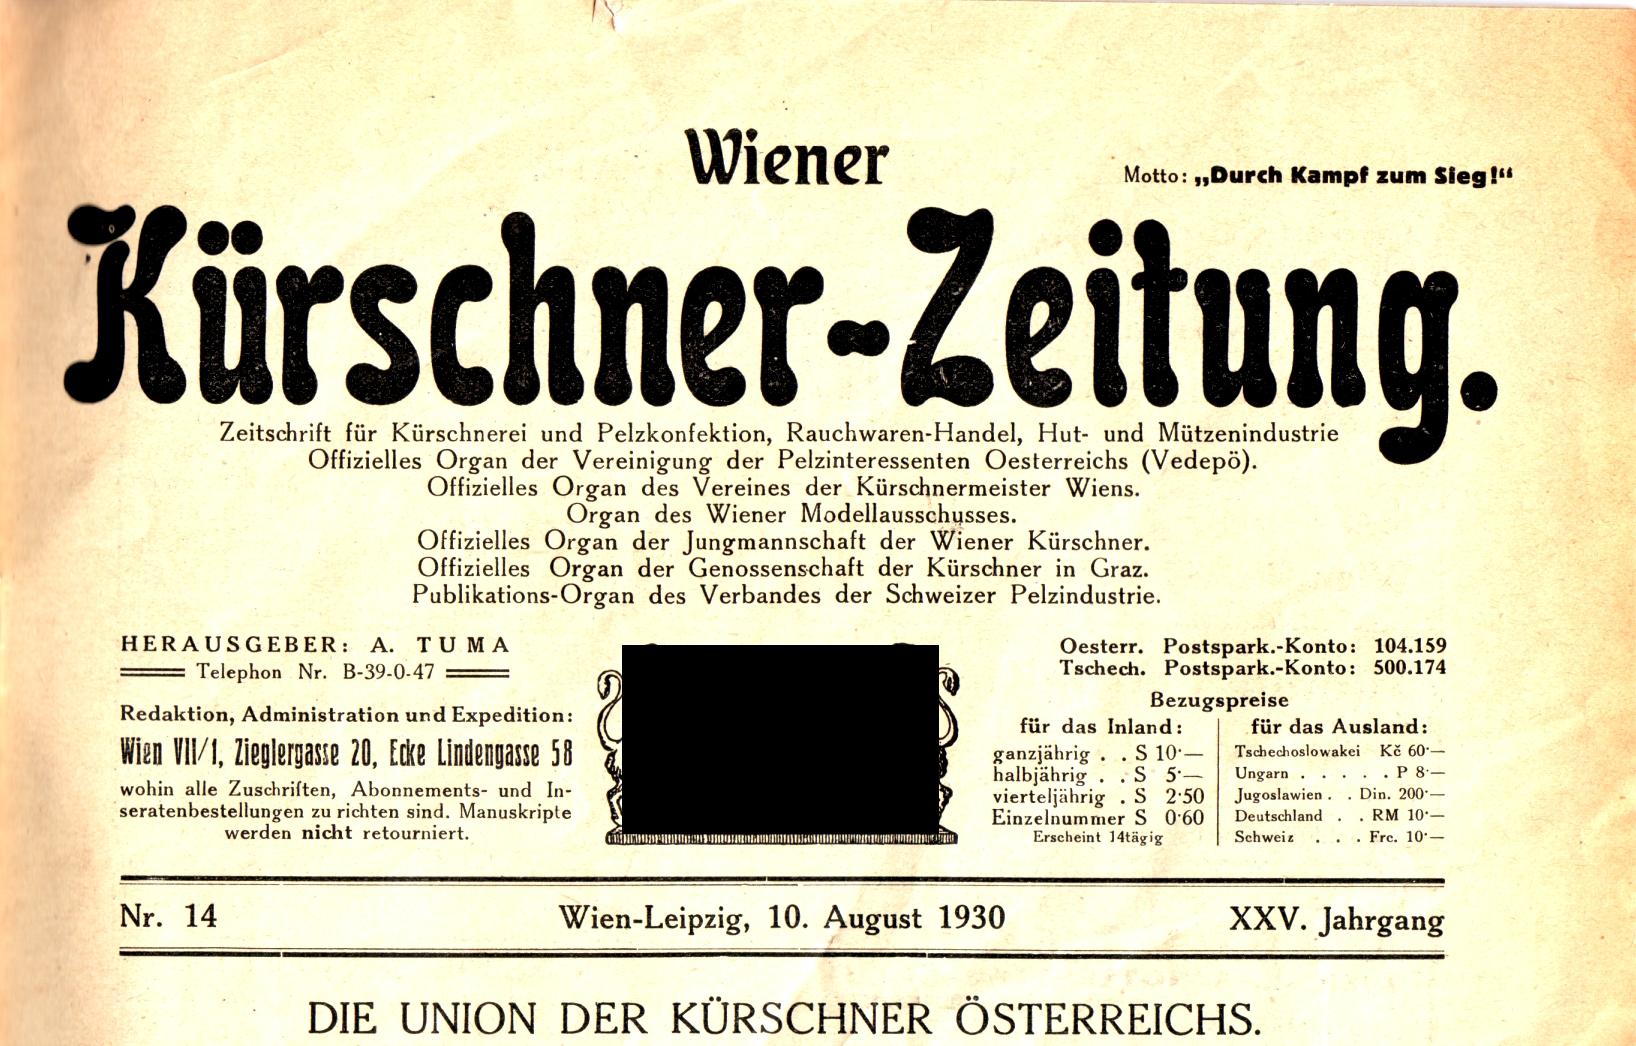 File:Wiener Kürschner-Zeitung, an Austrian furriers journal 1930-08 ...